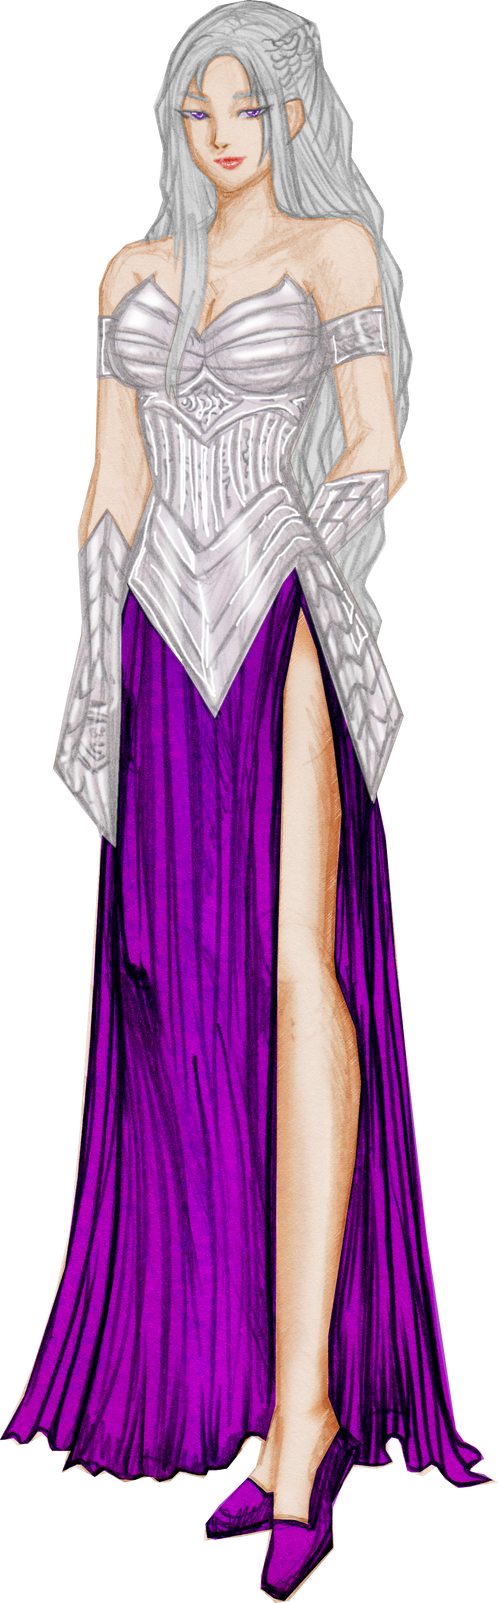 Silver and Purple version by justinedarkchylde